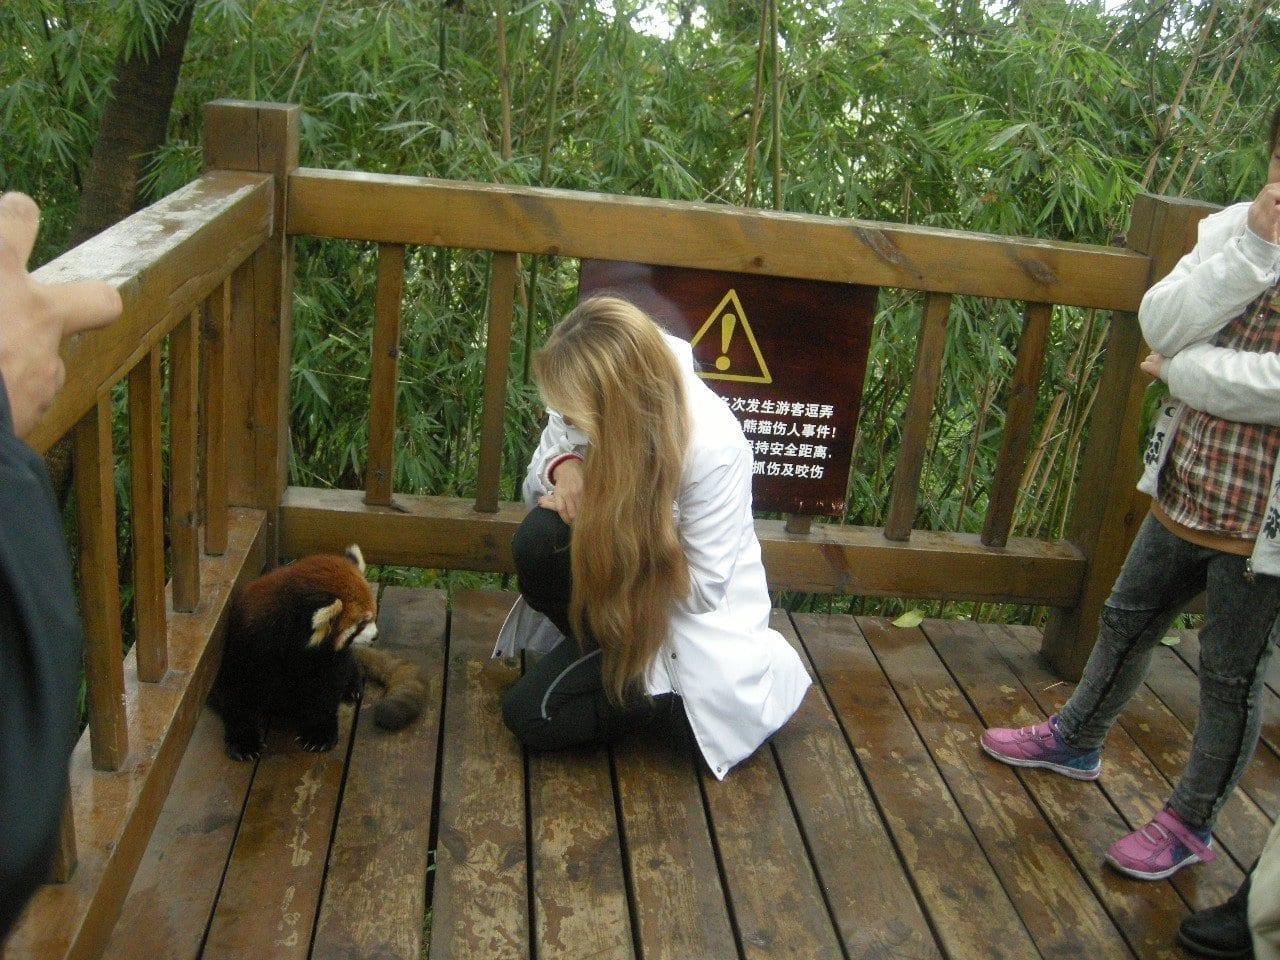 Our Italian Guests Visit Giant Panda